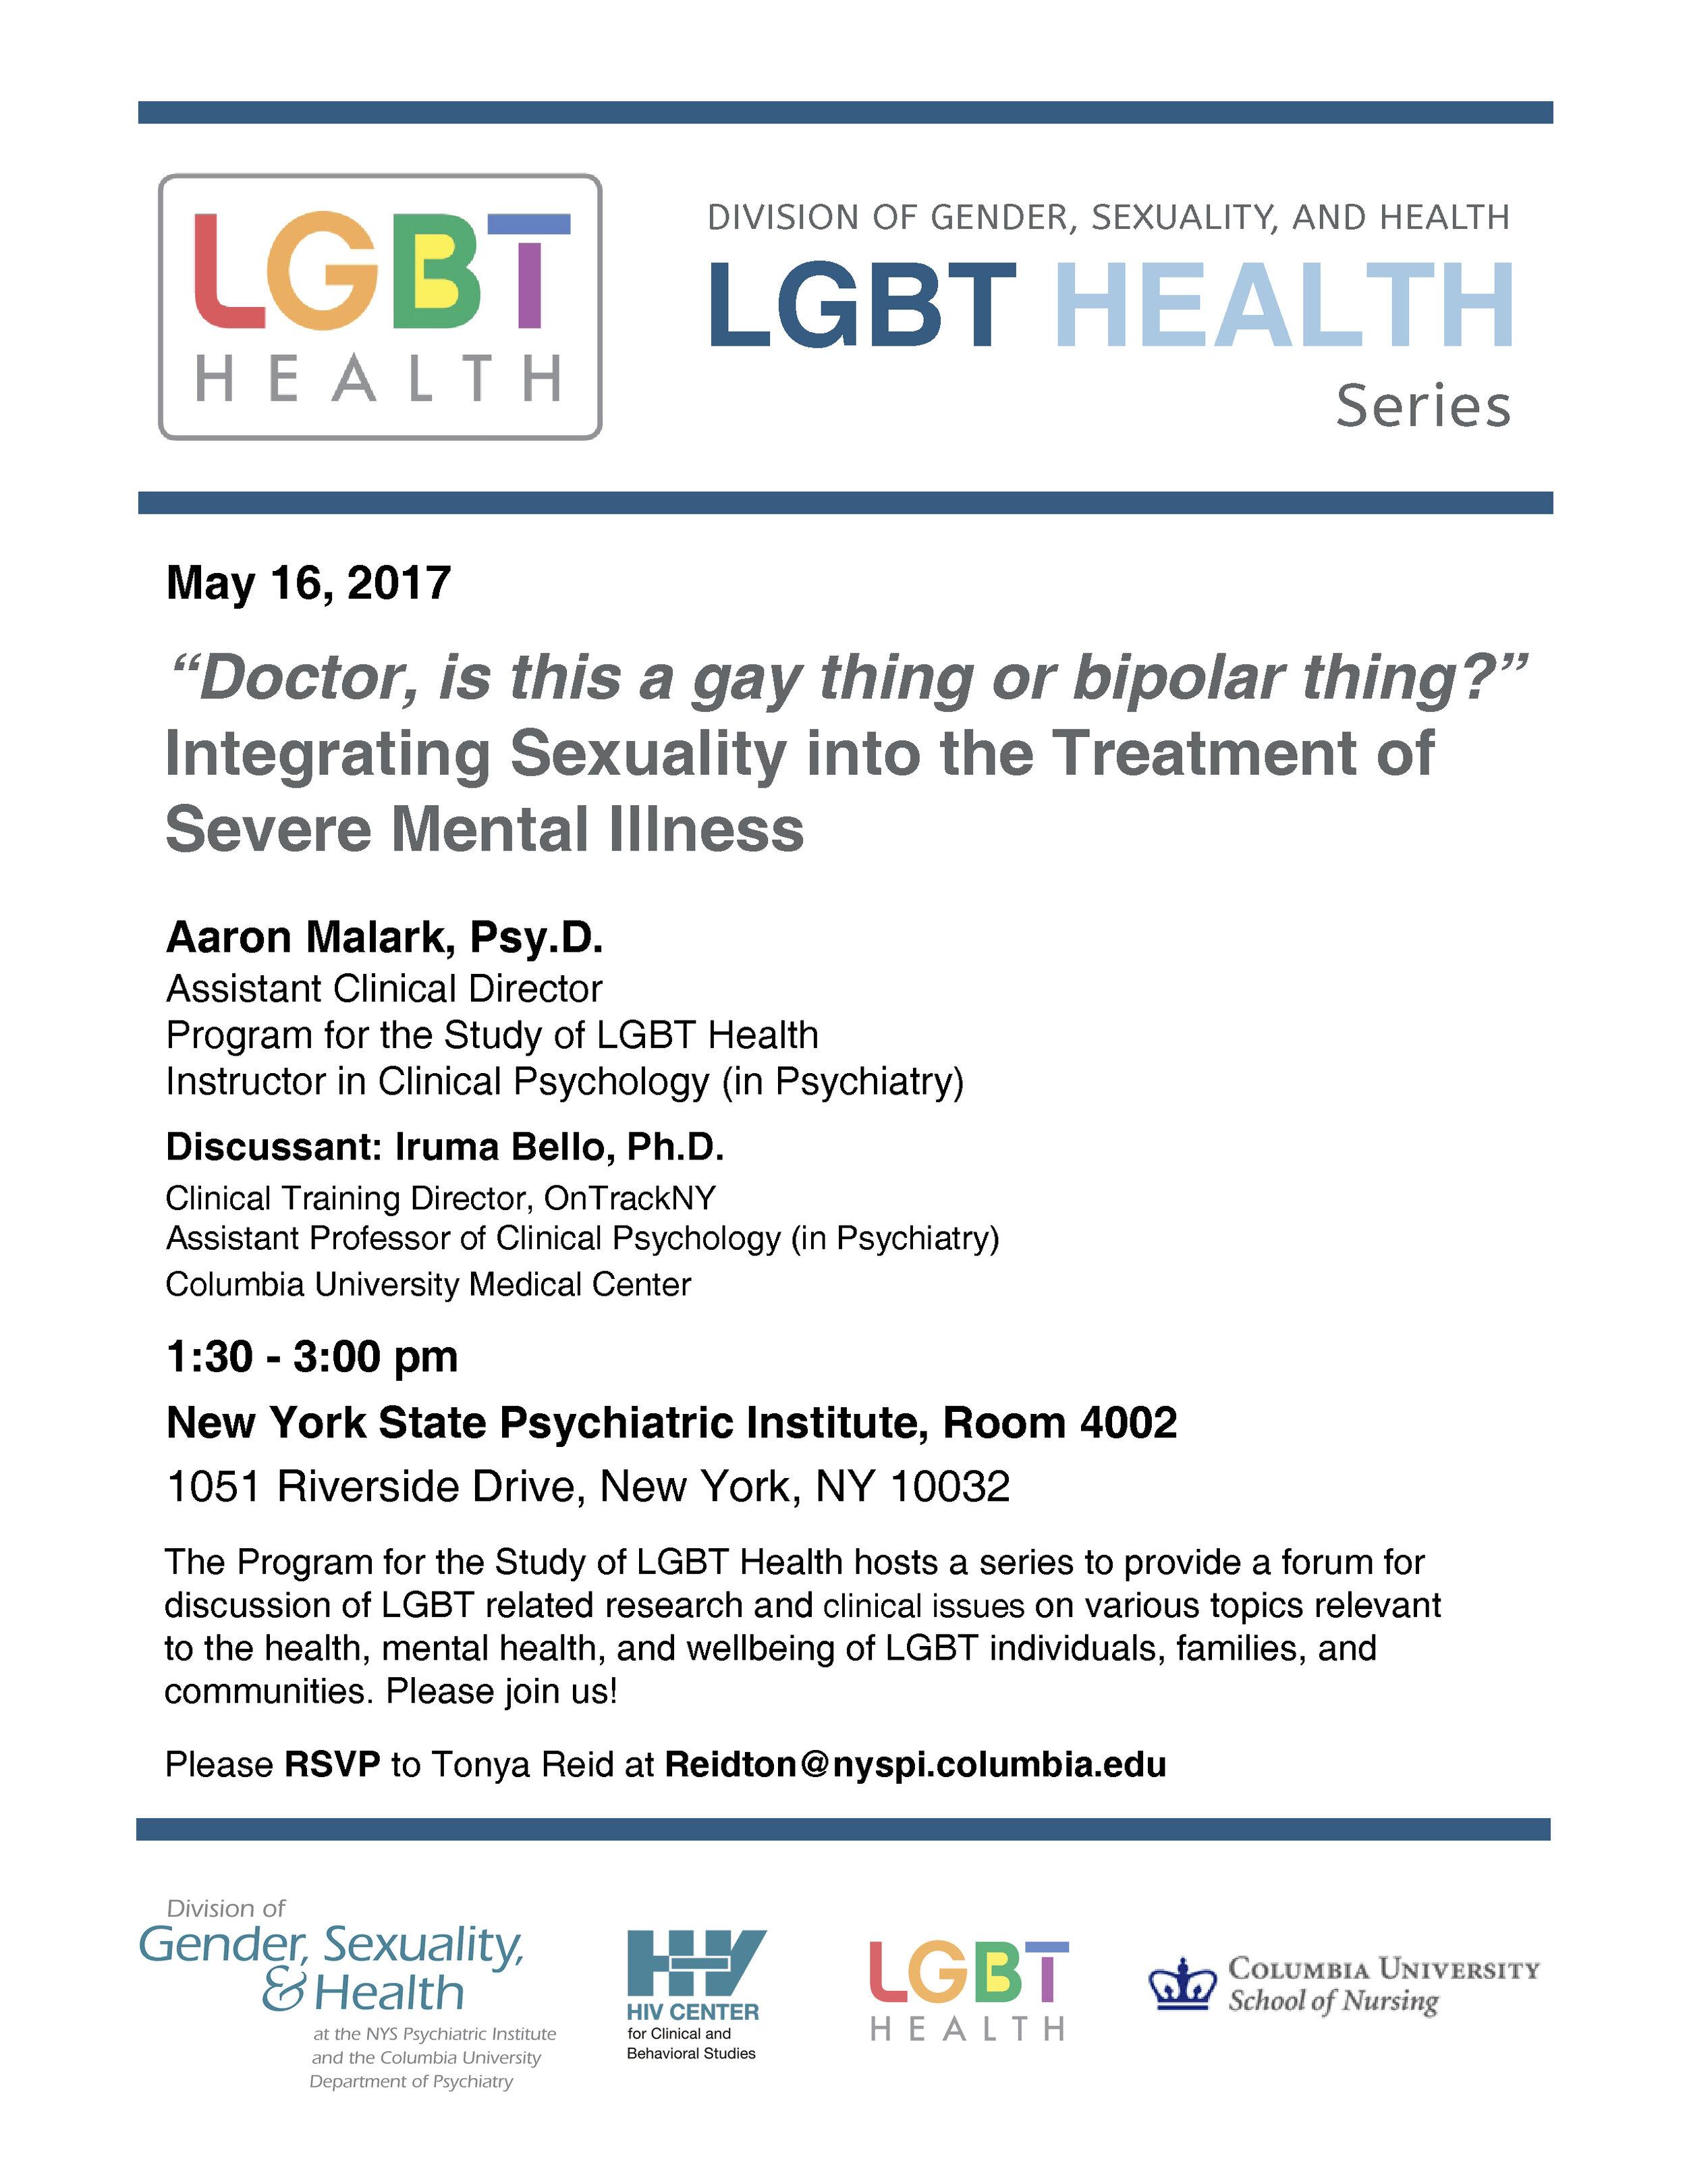 LGBT Health Series May 16 2017.jpg